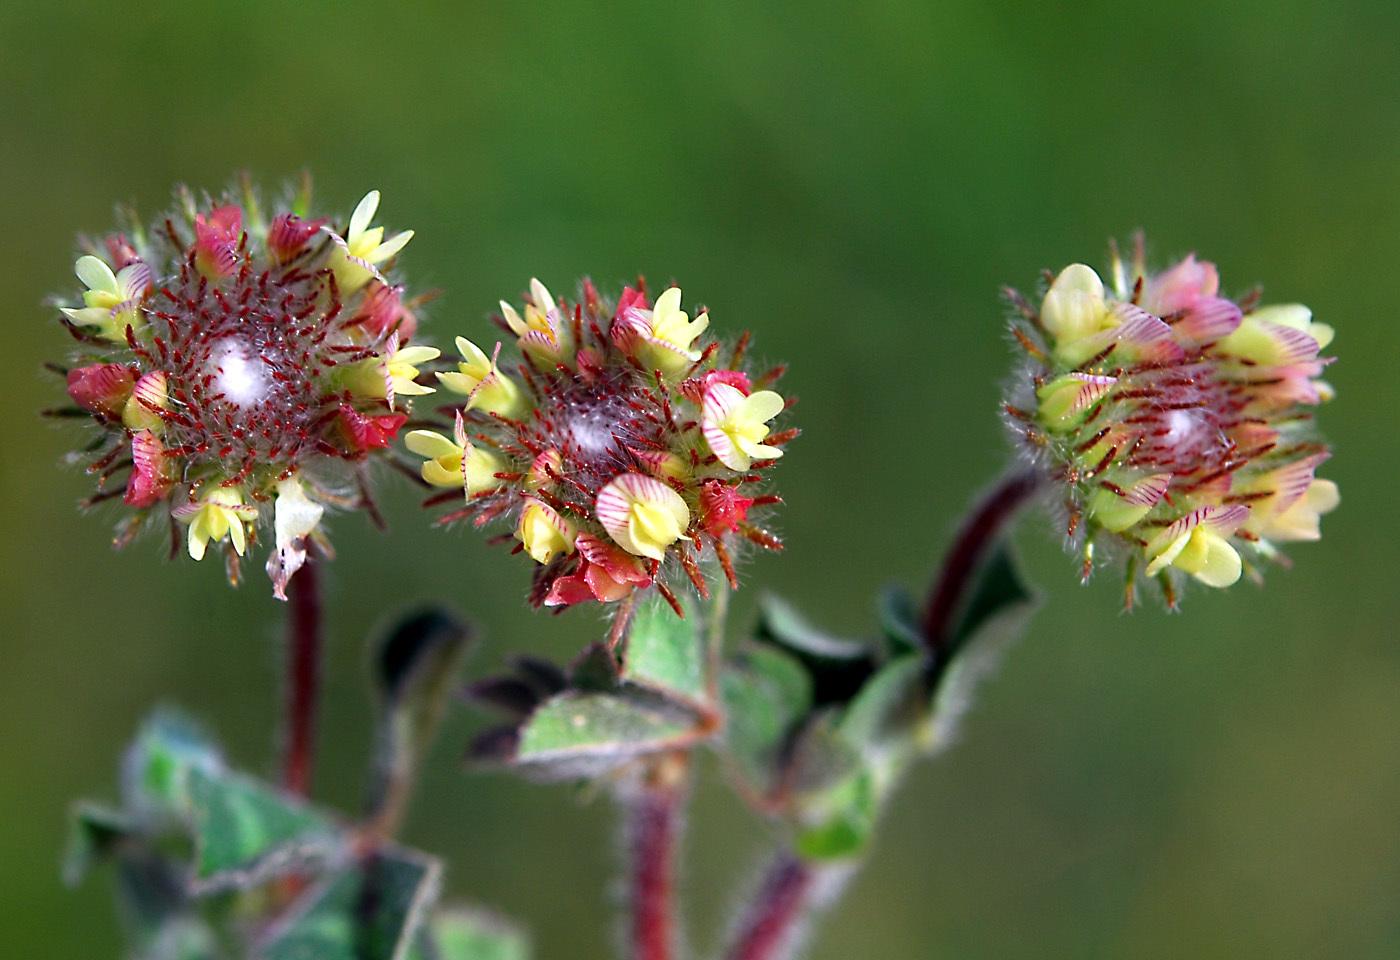 https://pictures.bgbm.org/digilib/Scaler?fn=Cyprus/Trifolium_globosum_B1.jpg&mo=file